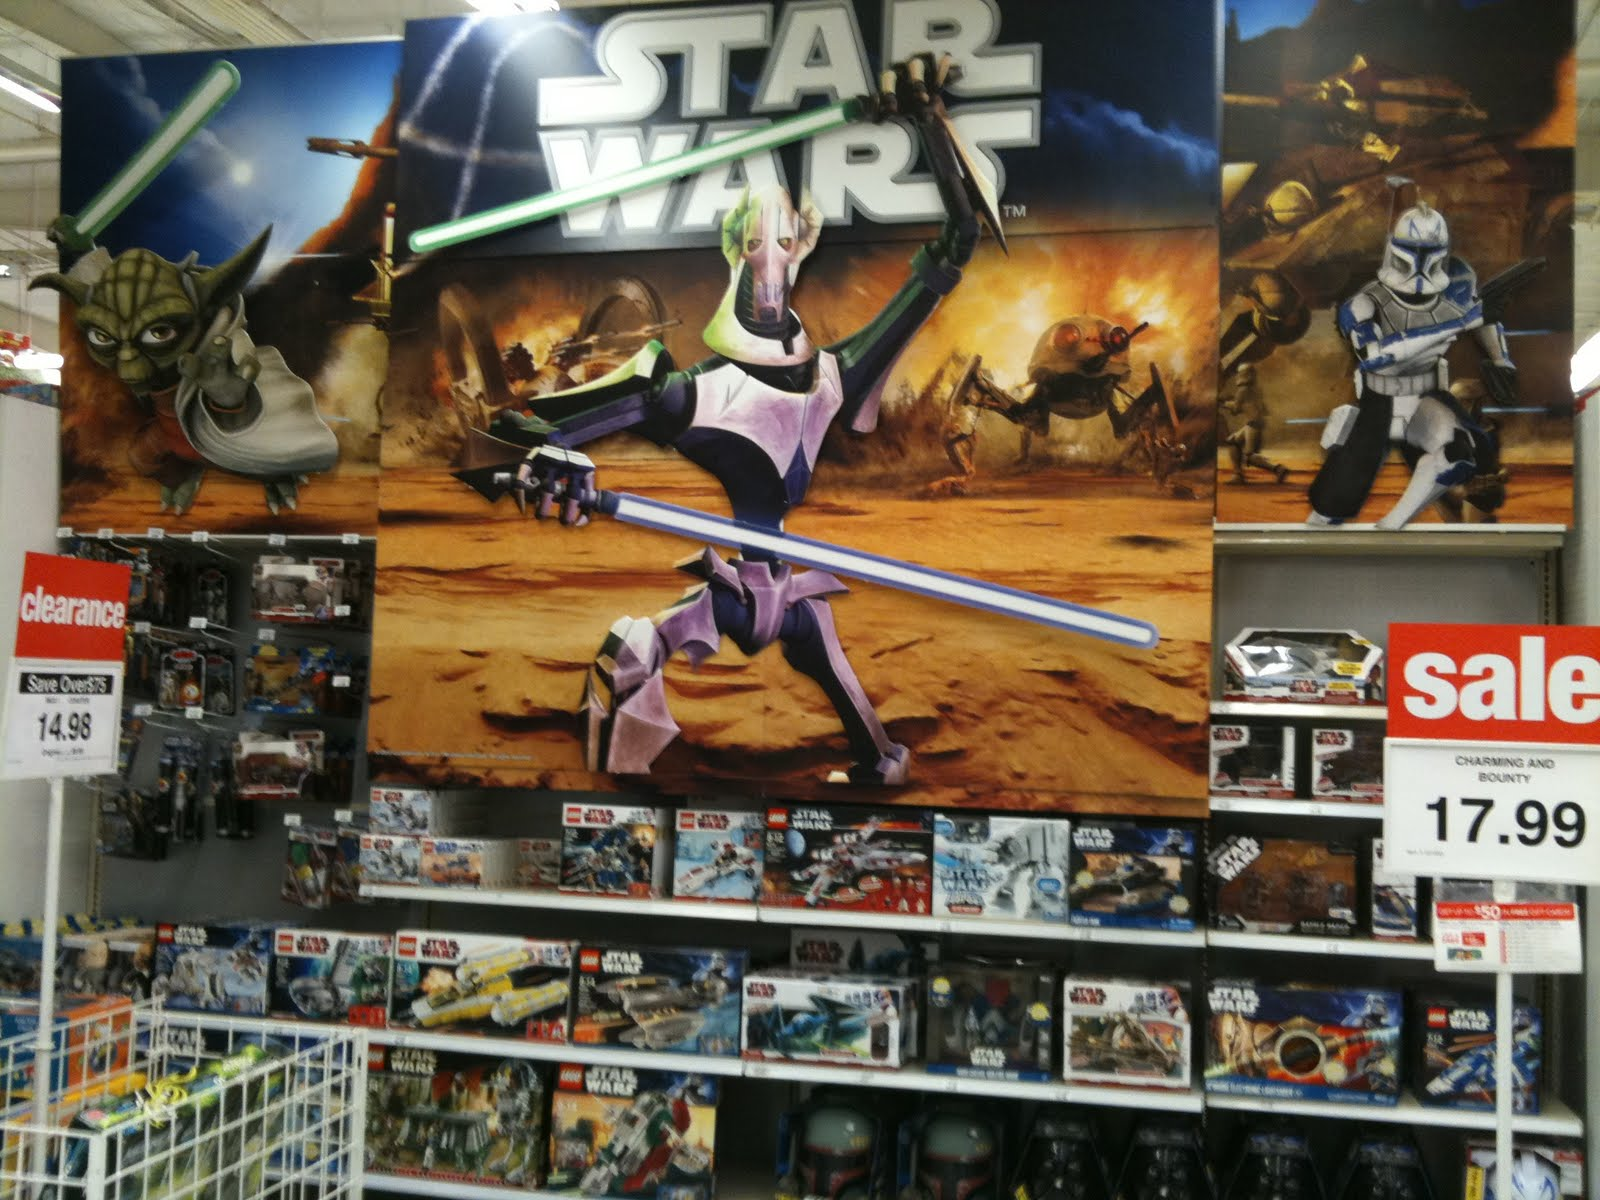 Nostalgic G: Target and Toys R Us Star Wars merchandise reset...